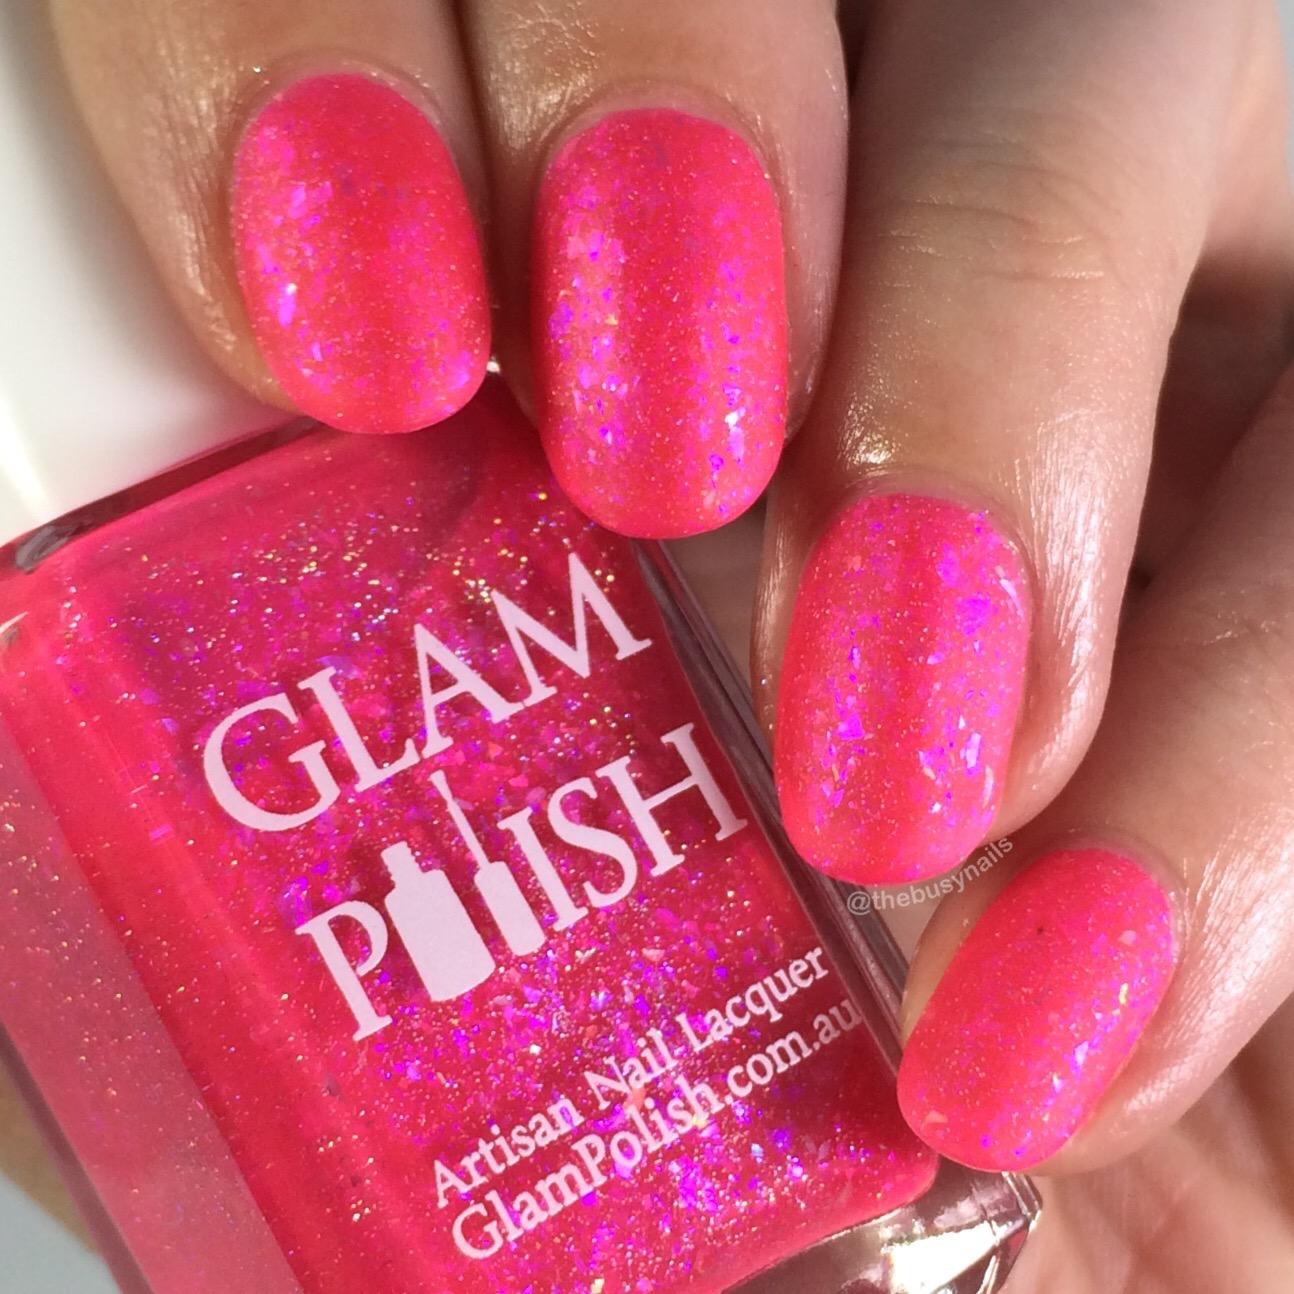 glam-polish-shore-thing1.jpg